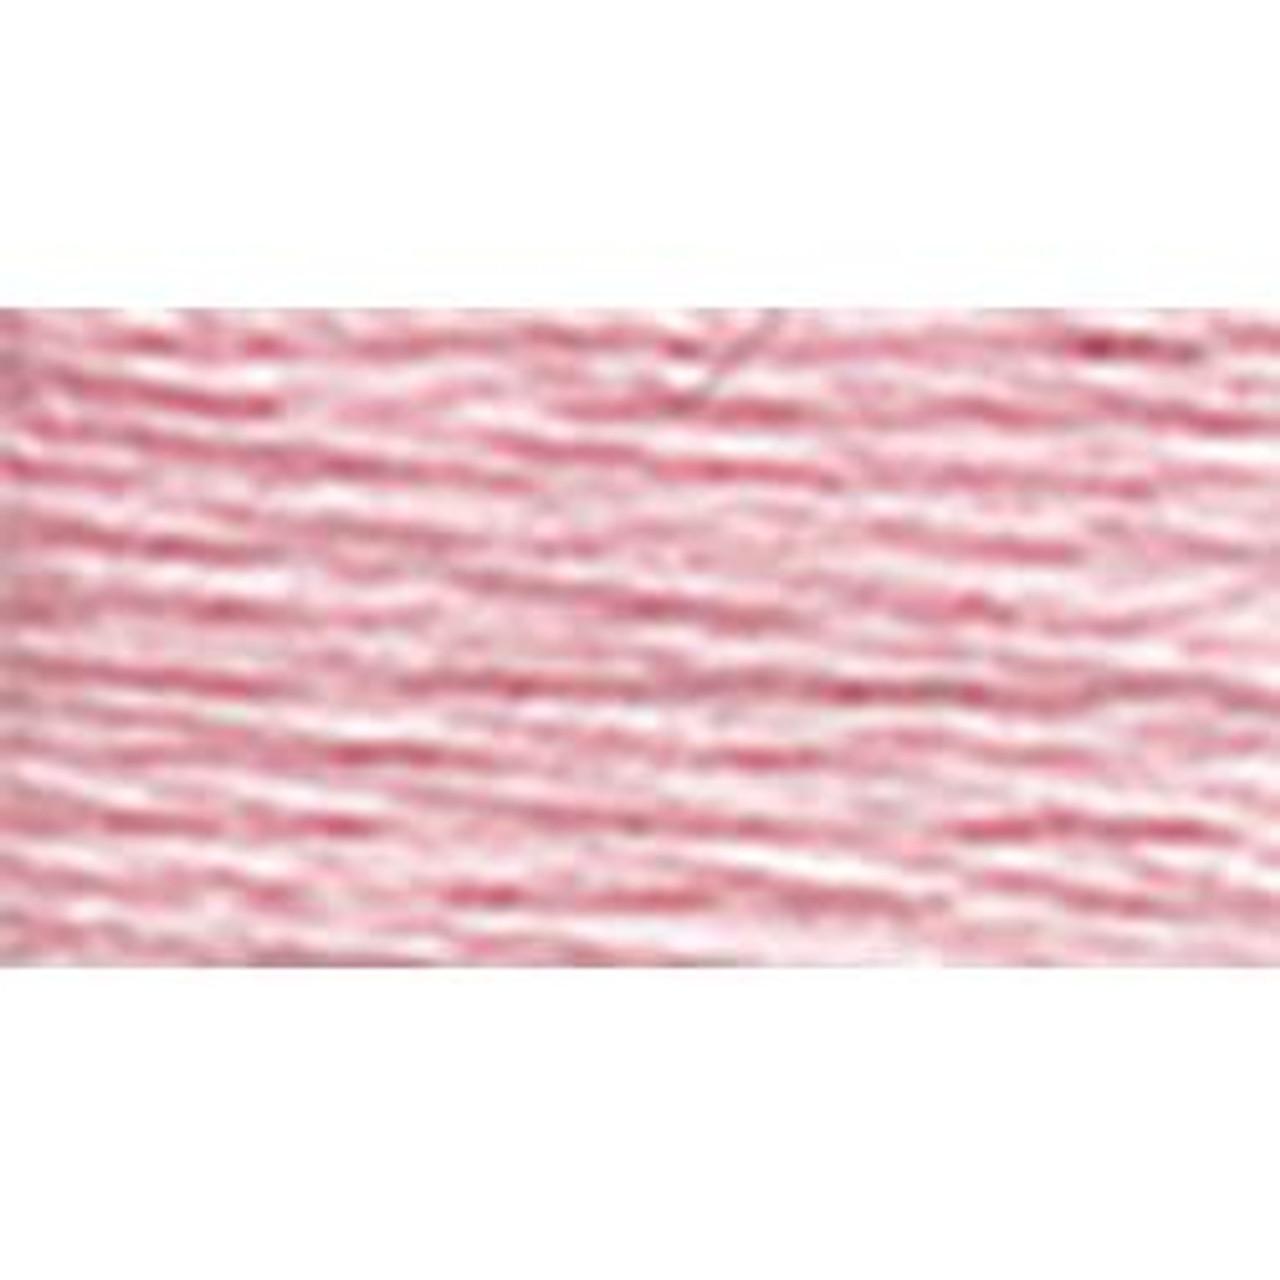 Light Mauve #8 DMC Pearl Cotton Cord - 87yd spool (#3689)